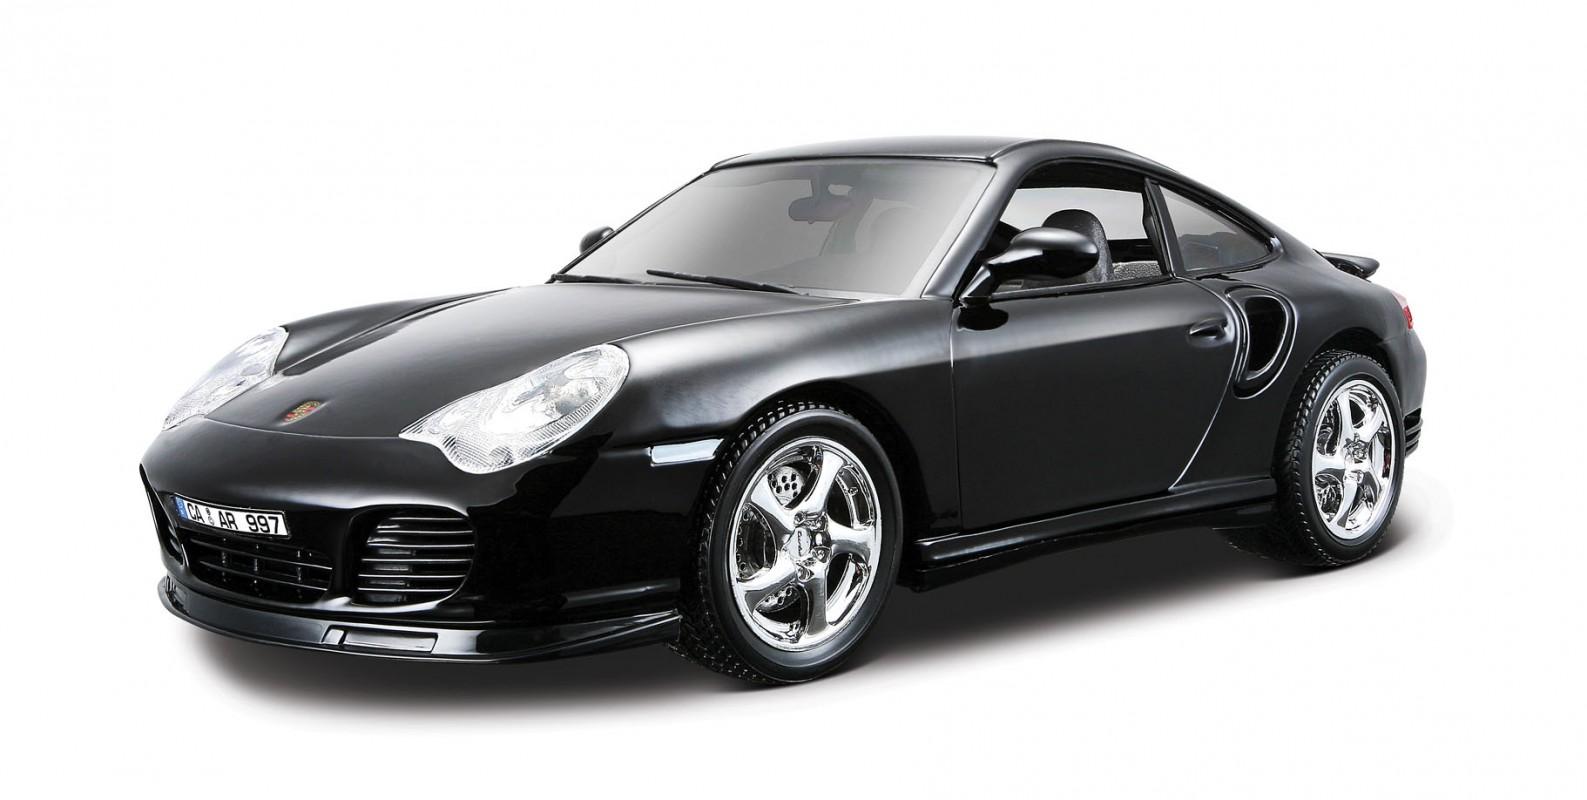 Bburago - Porsche 911 Turbo 1:18